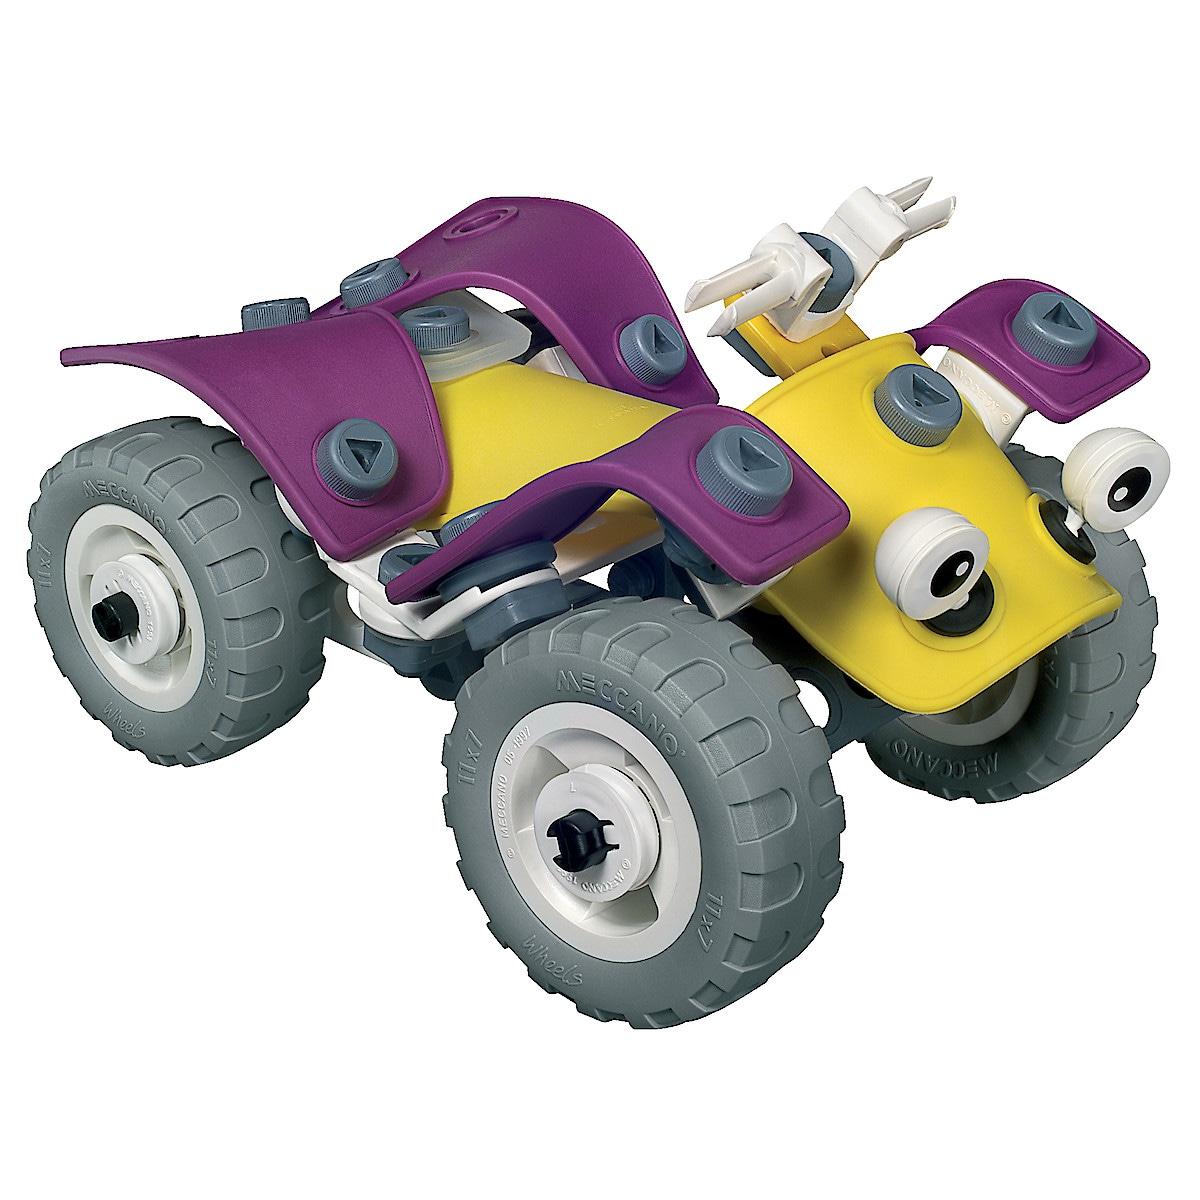 Fyrhjuling build & play Meccano